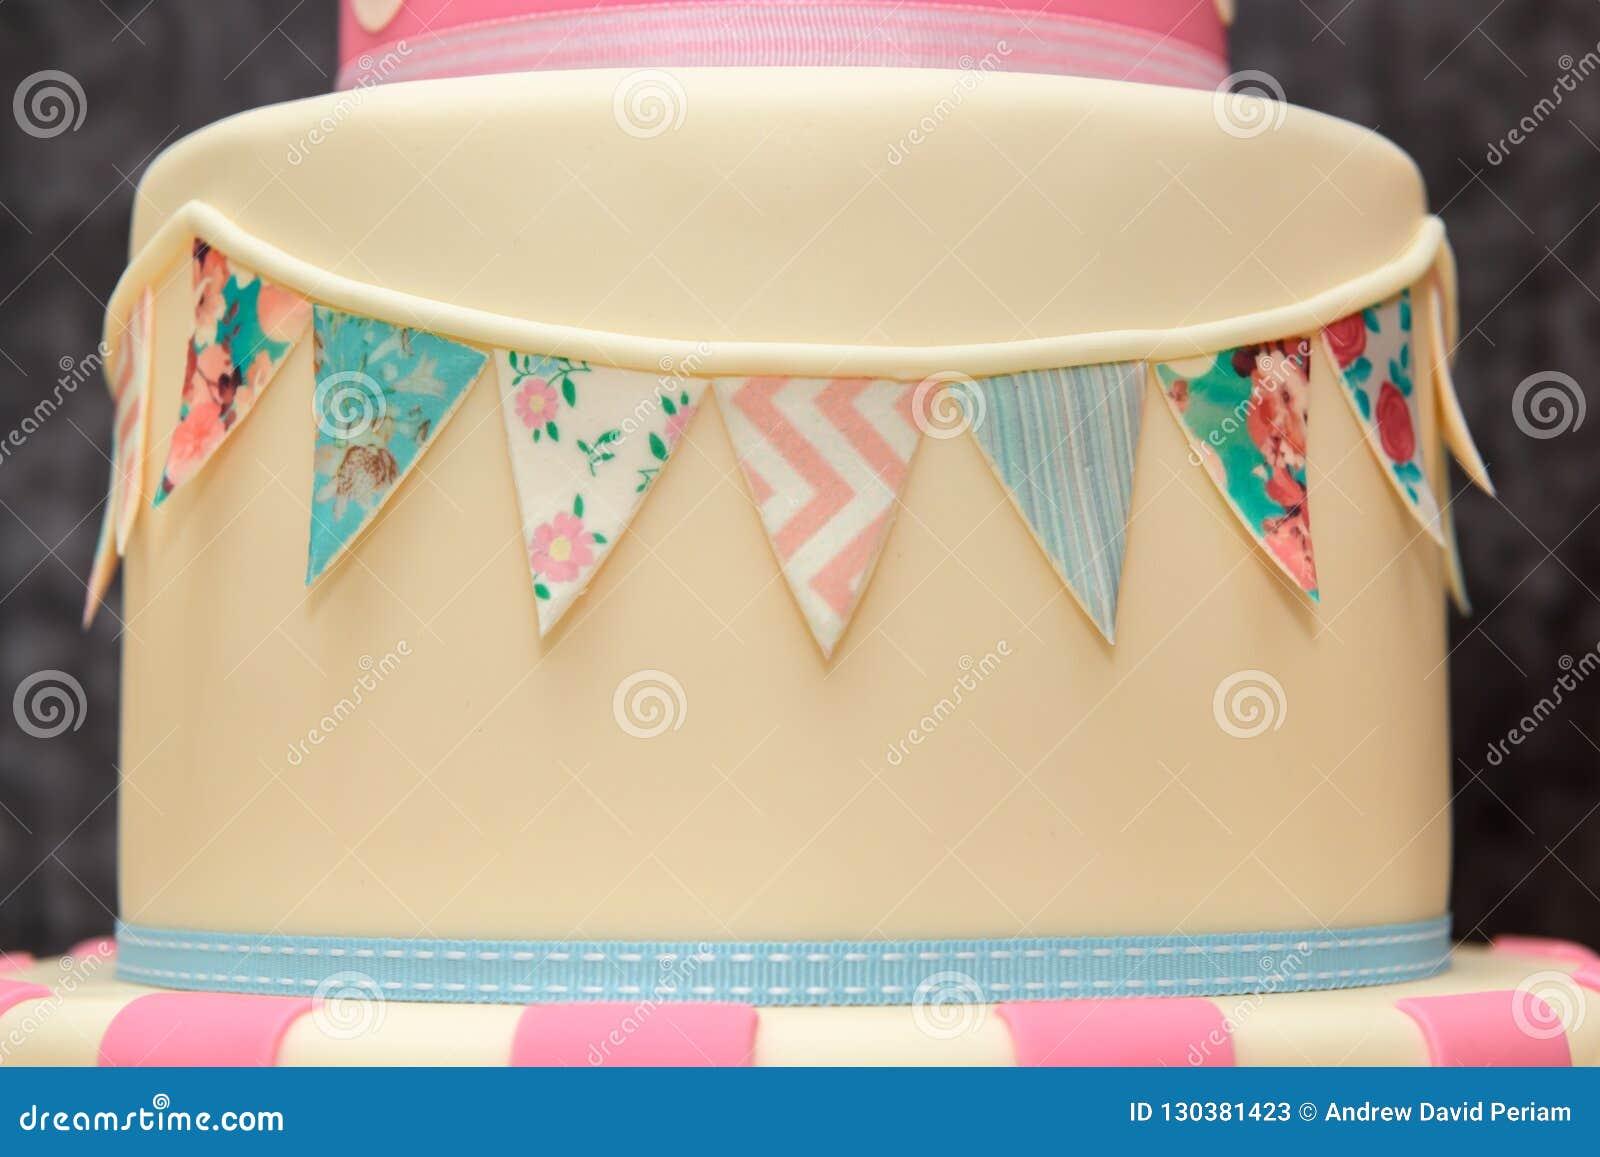 Superb 3 Tier Birthday Cake Stock Image Image Of Event Design 130381423 Funny Birthday Cards Online Chimdamsfinfo